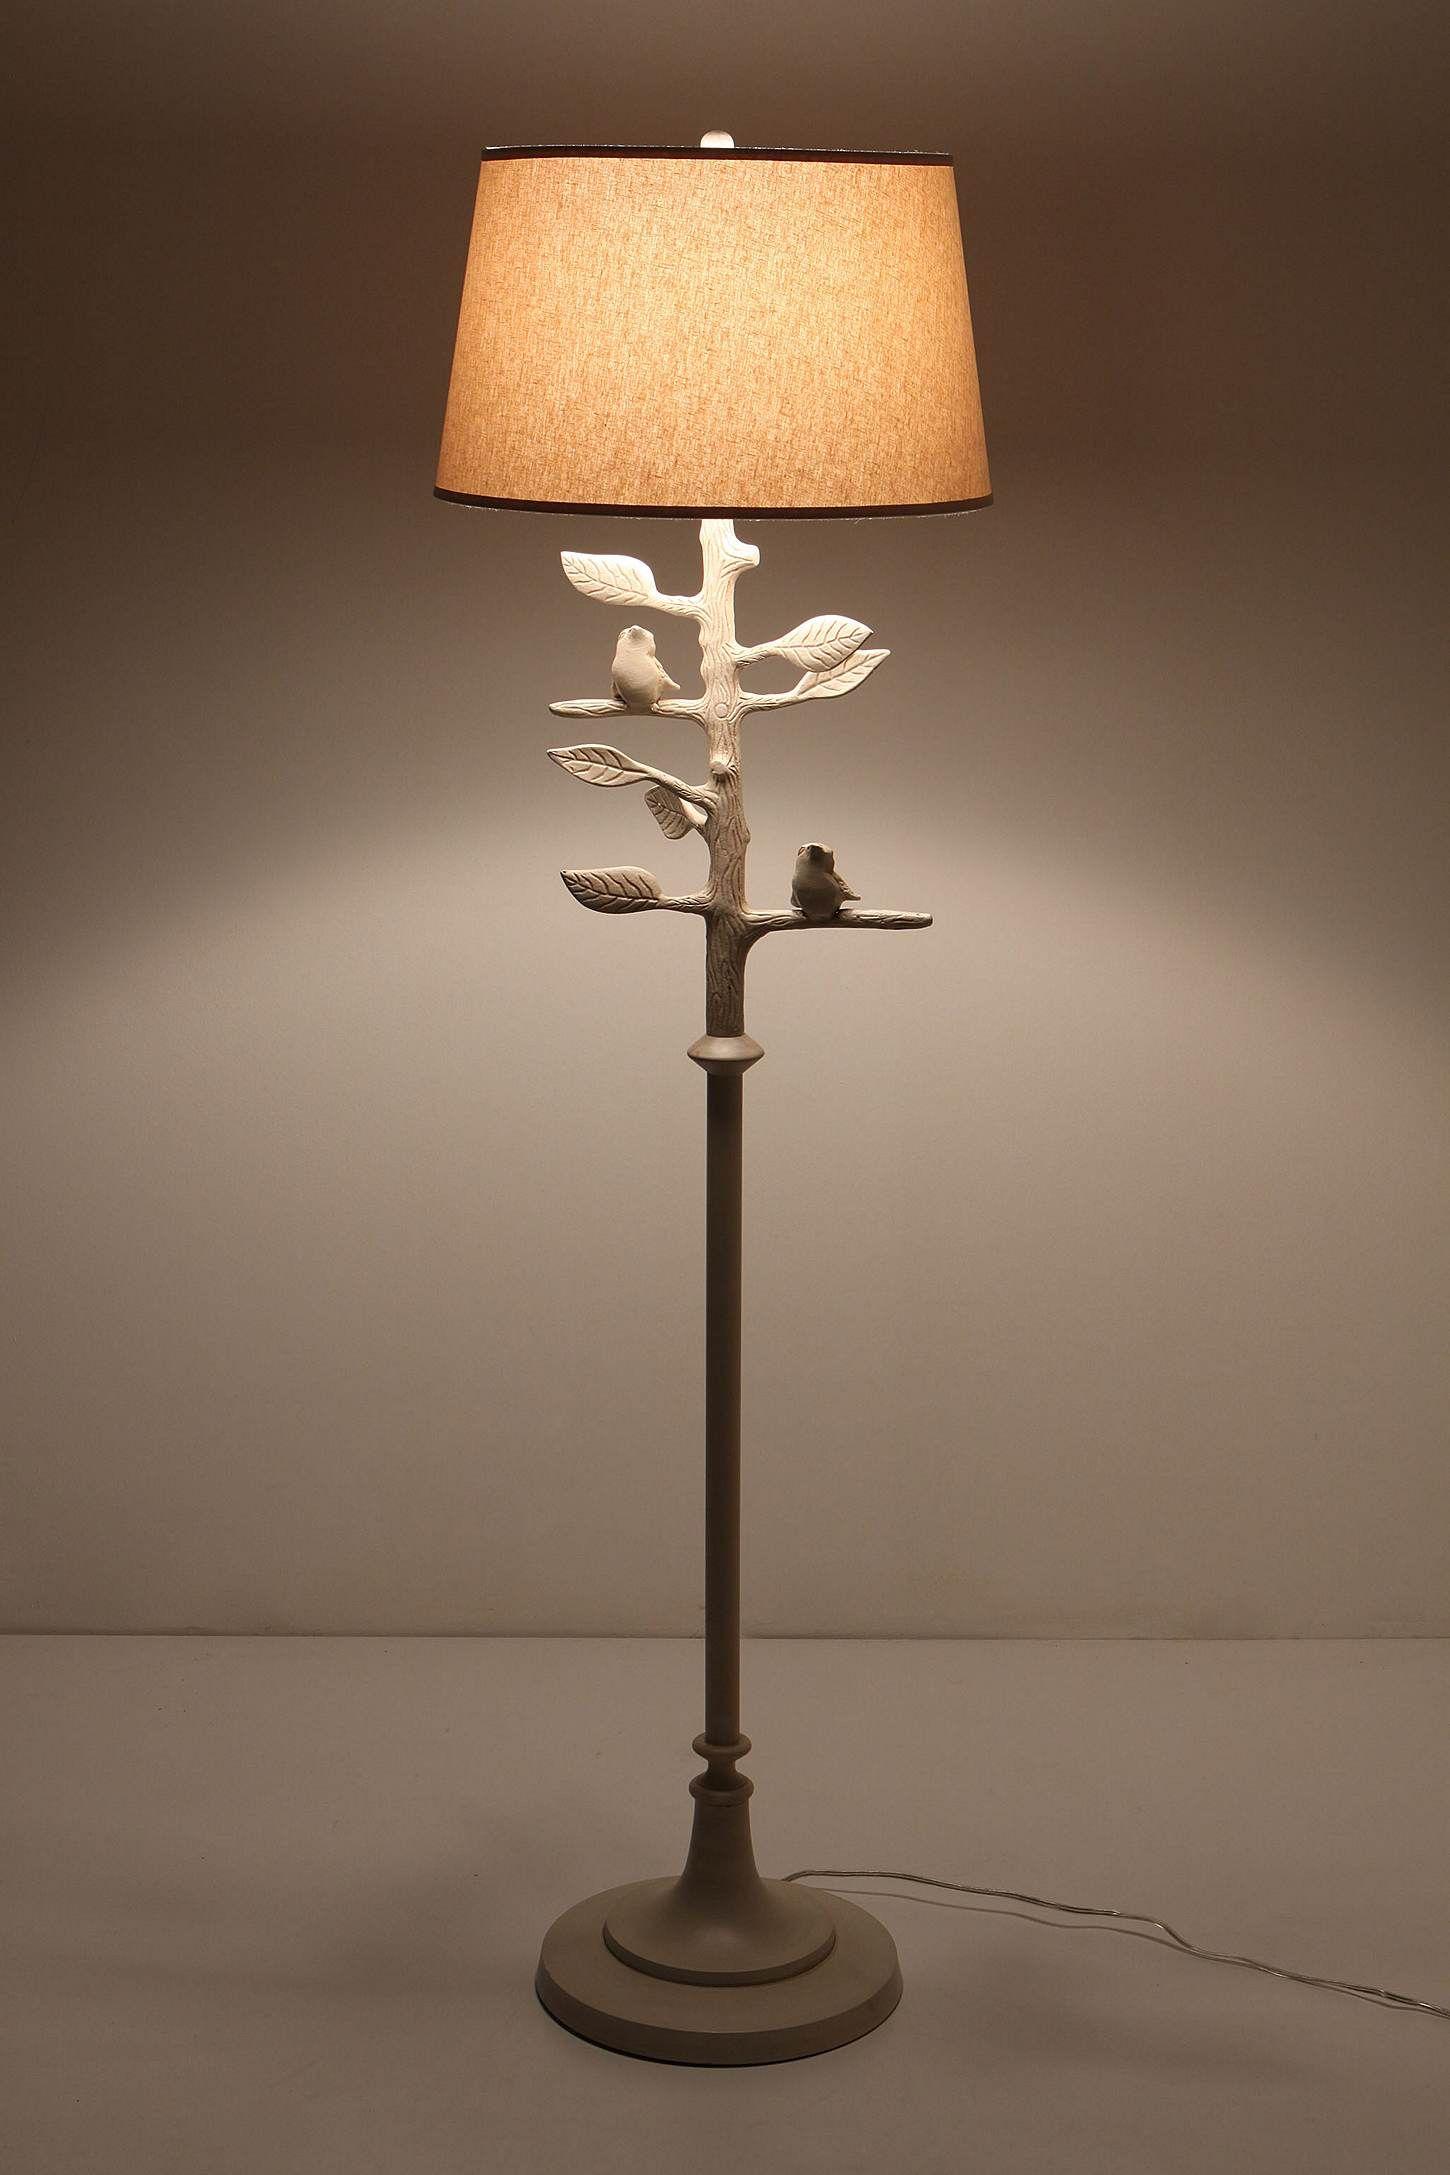 Sibley floor lamp from anthropologie